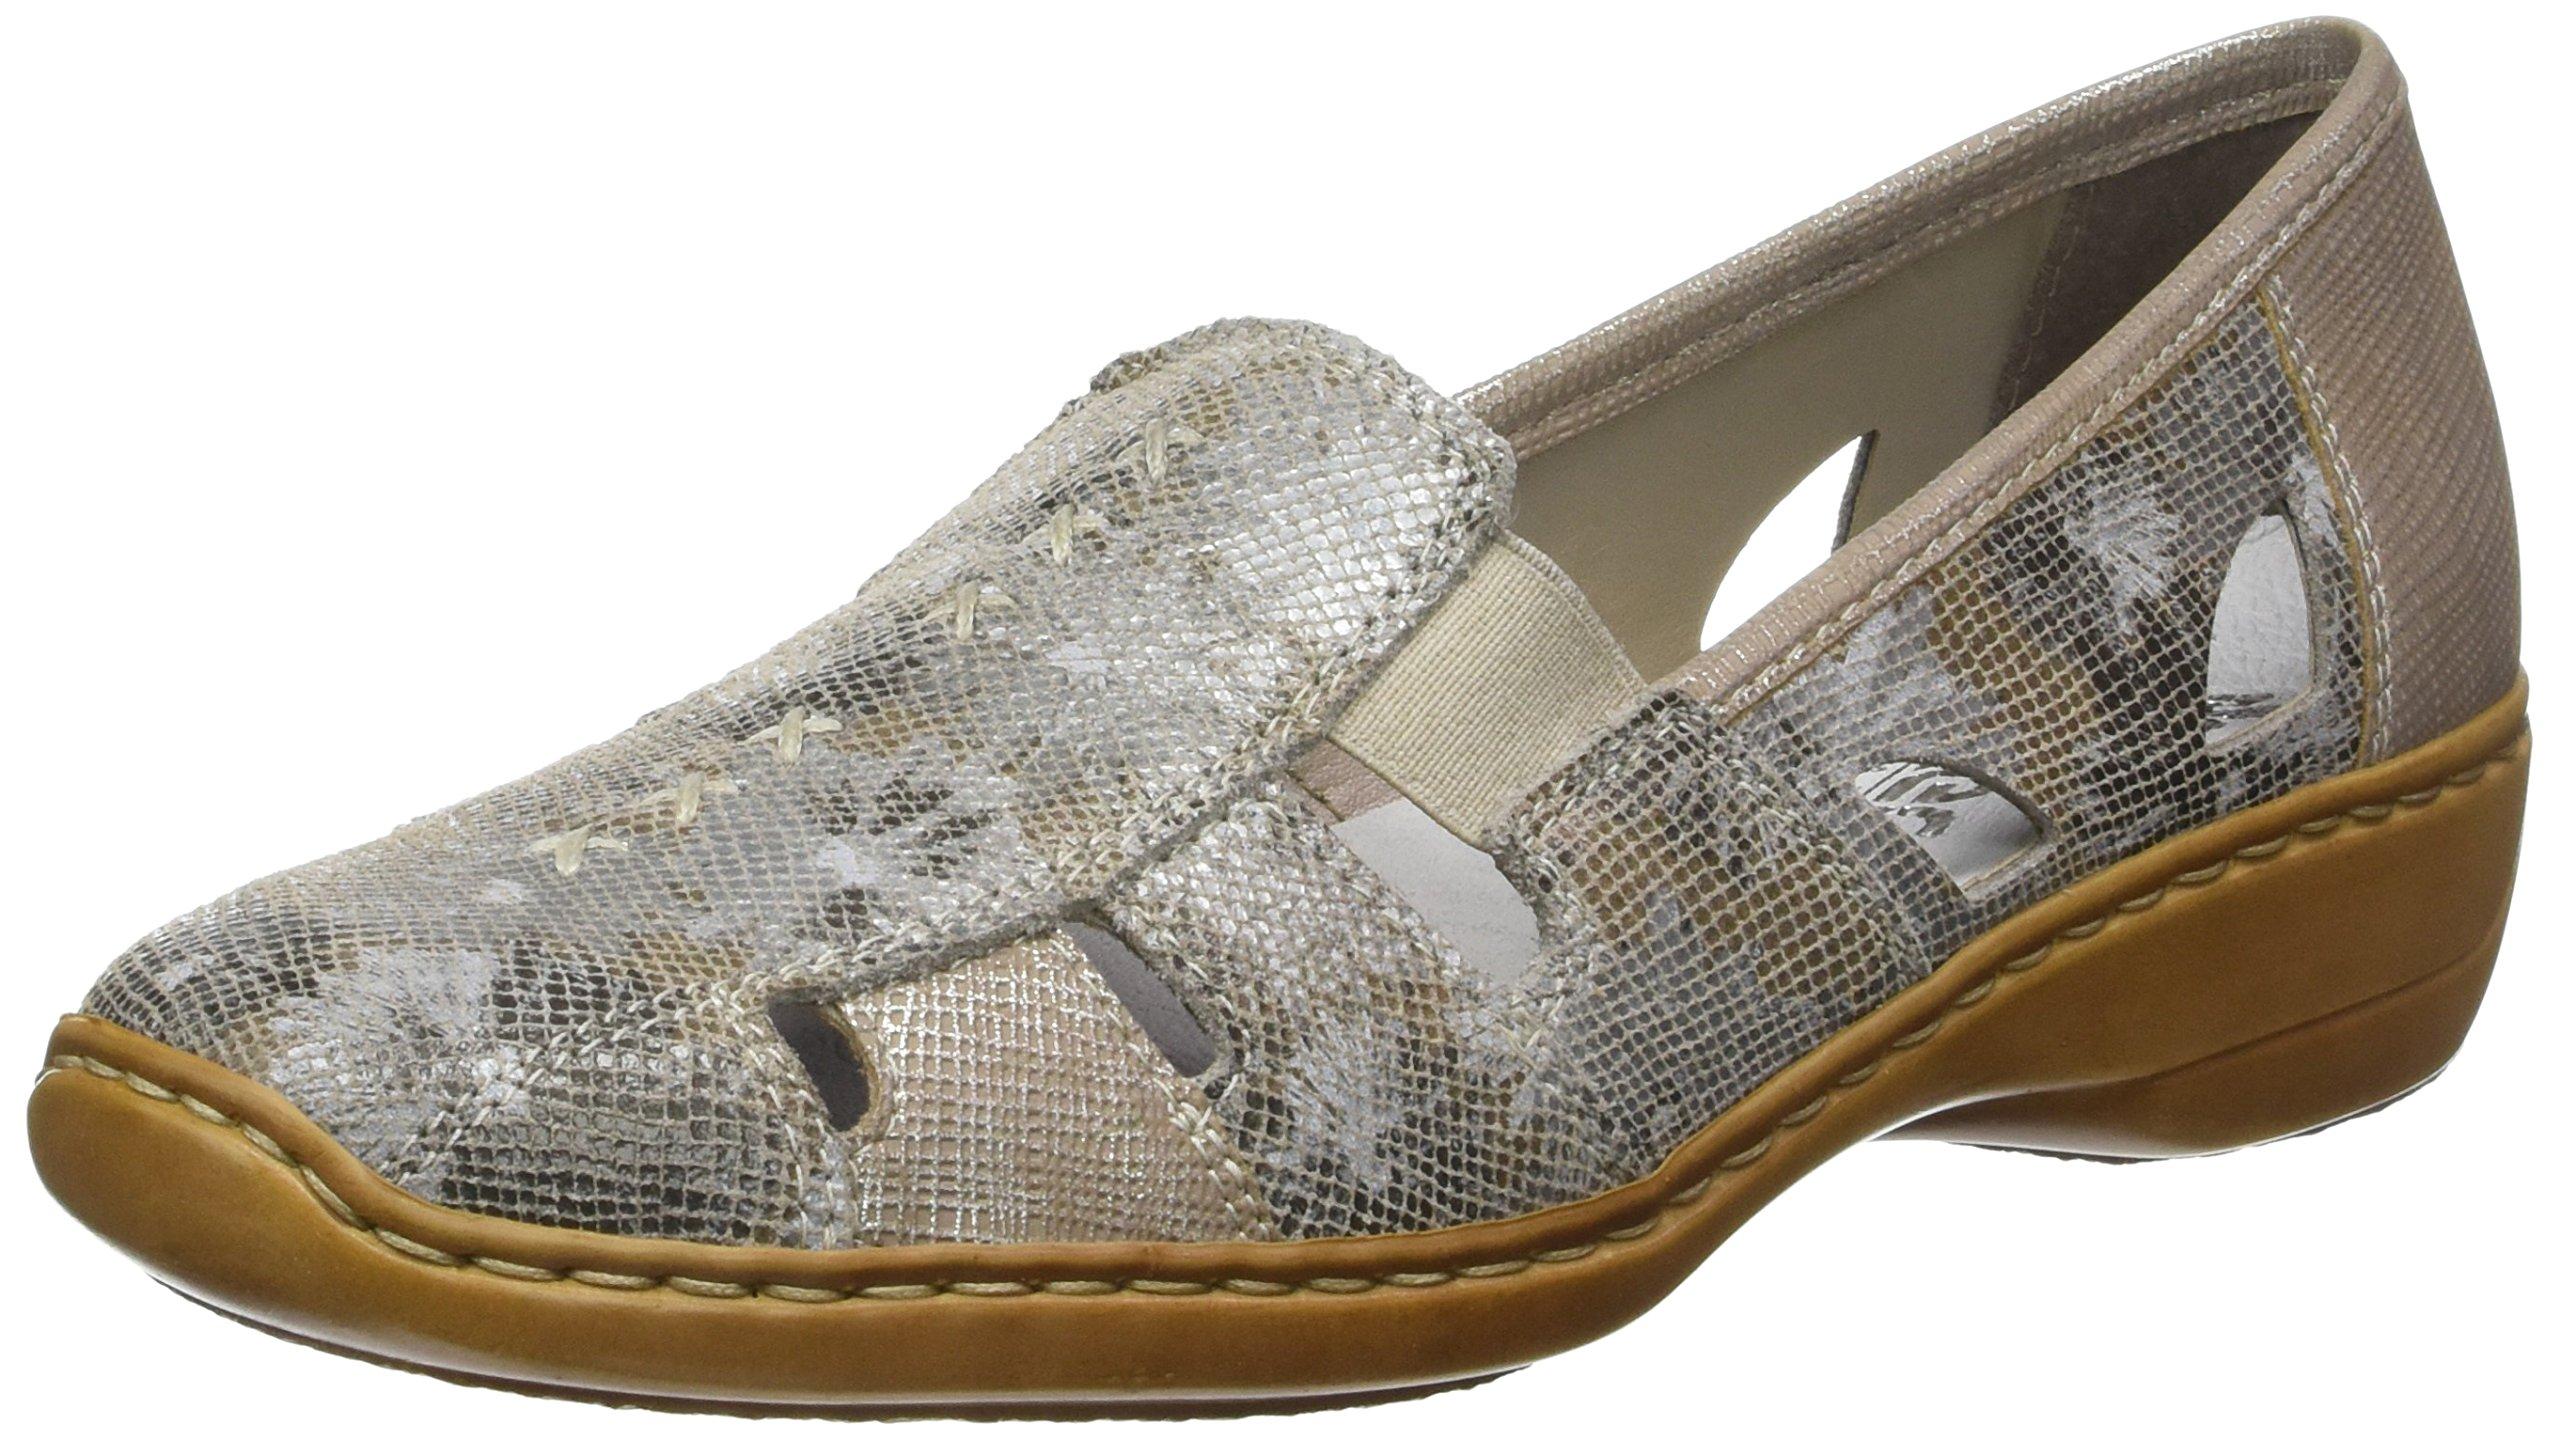 Rieker 41385 - 91 Altgold (Gold) Womens Shoes 6 US